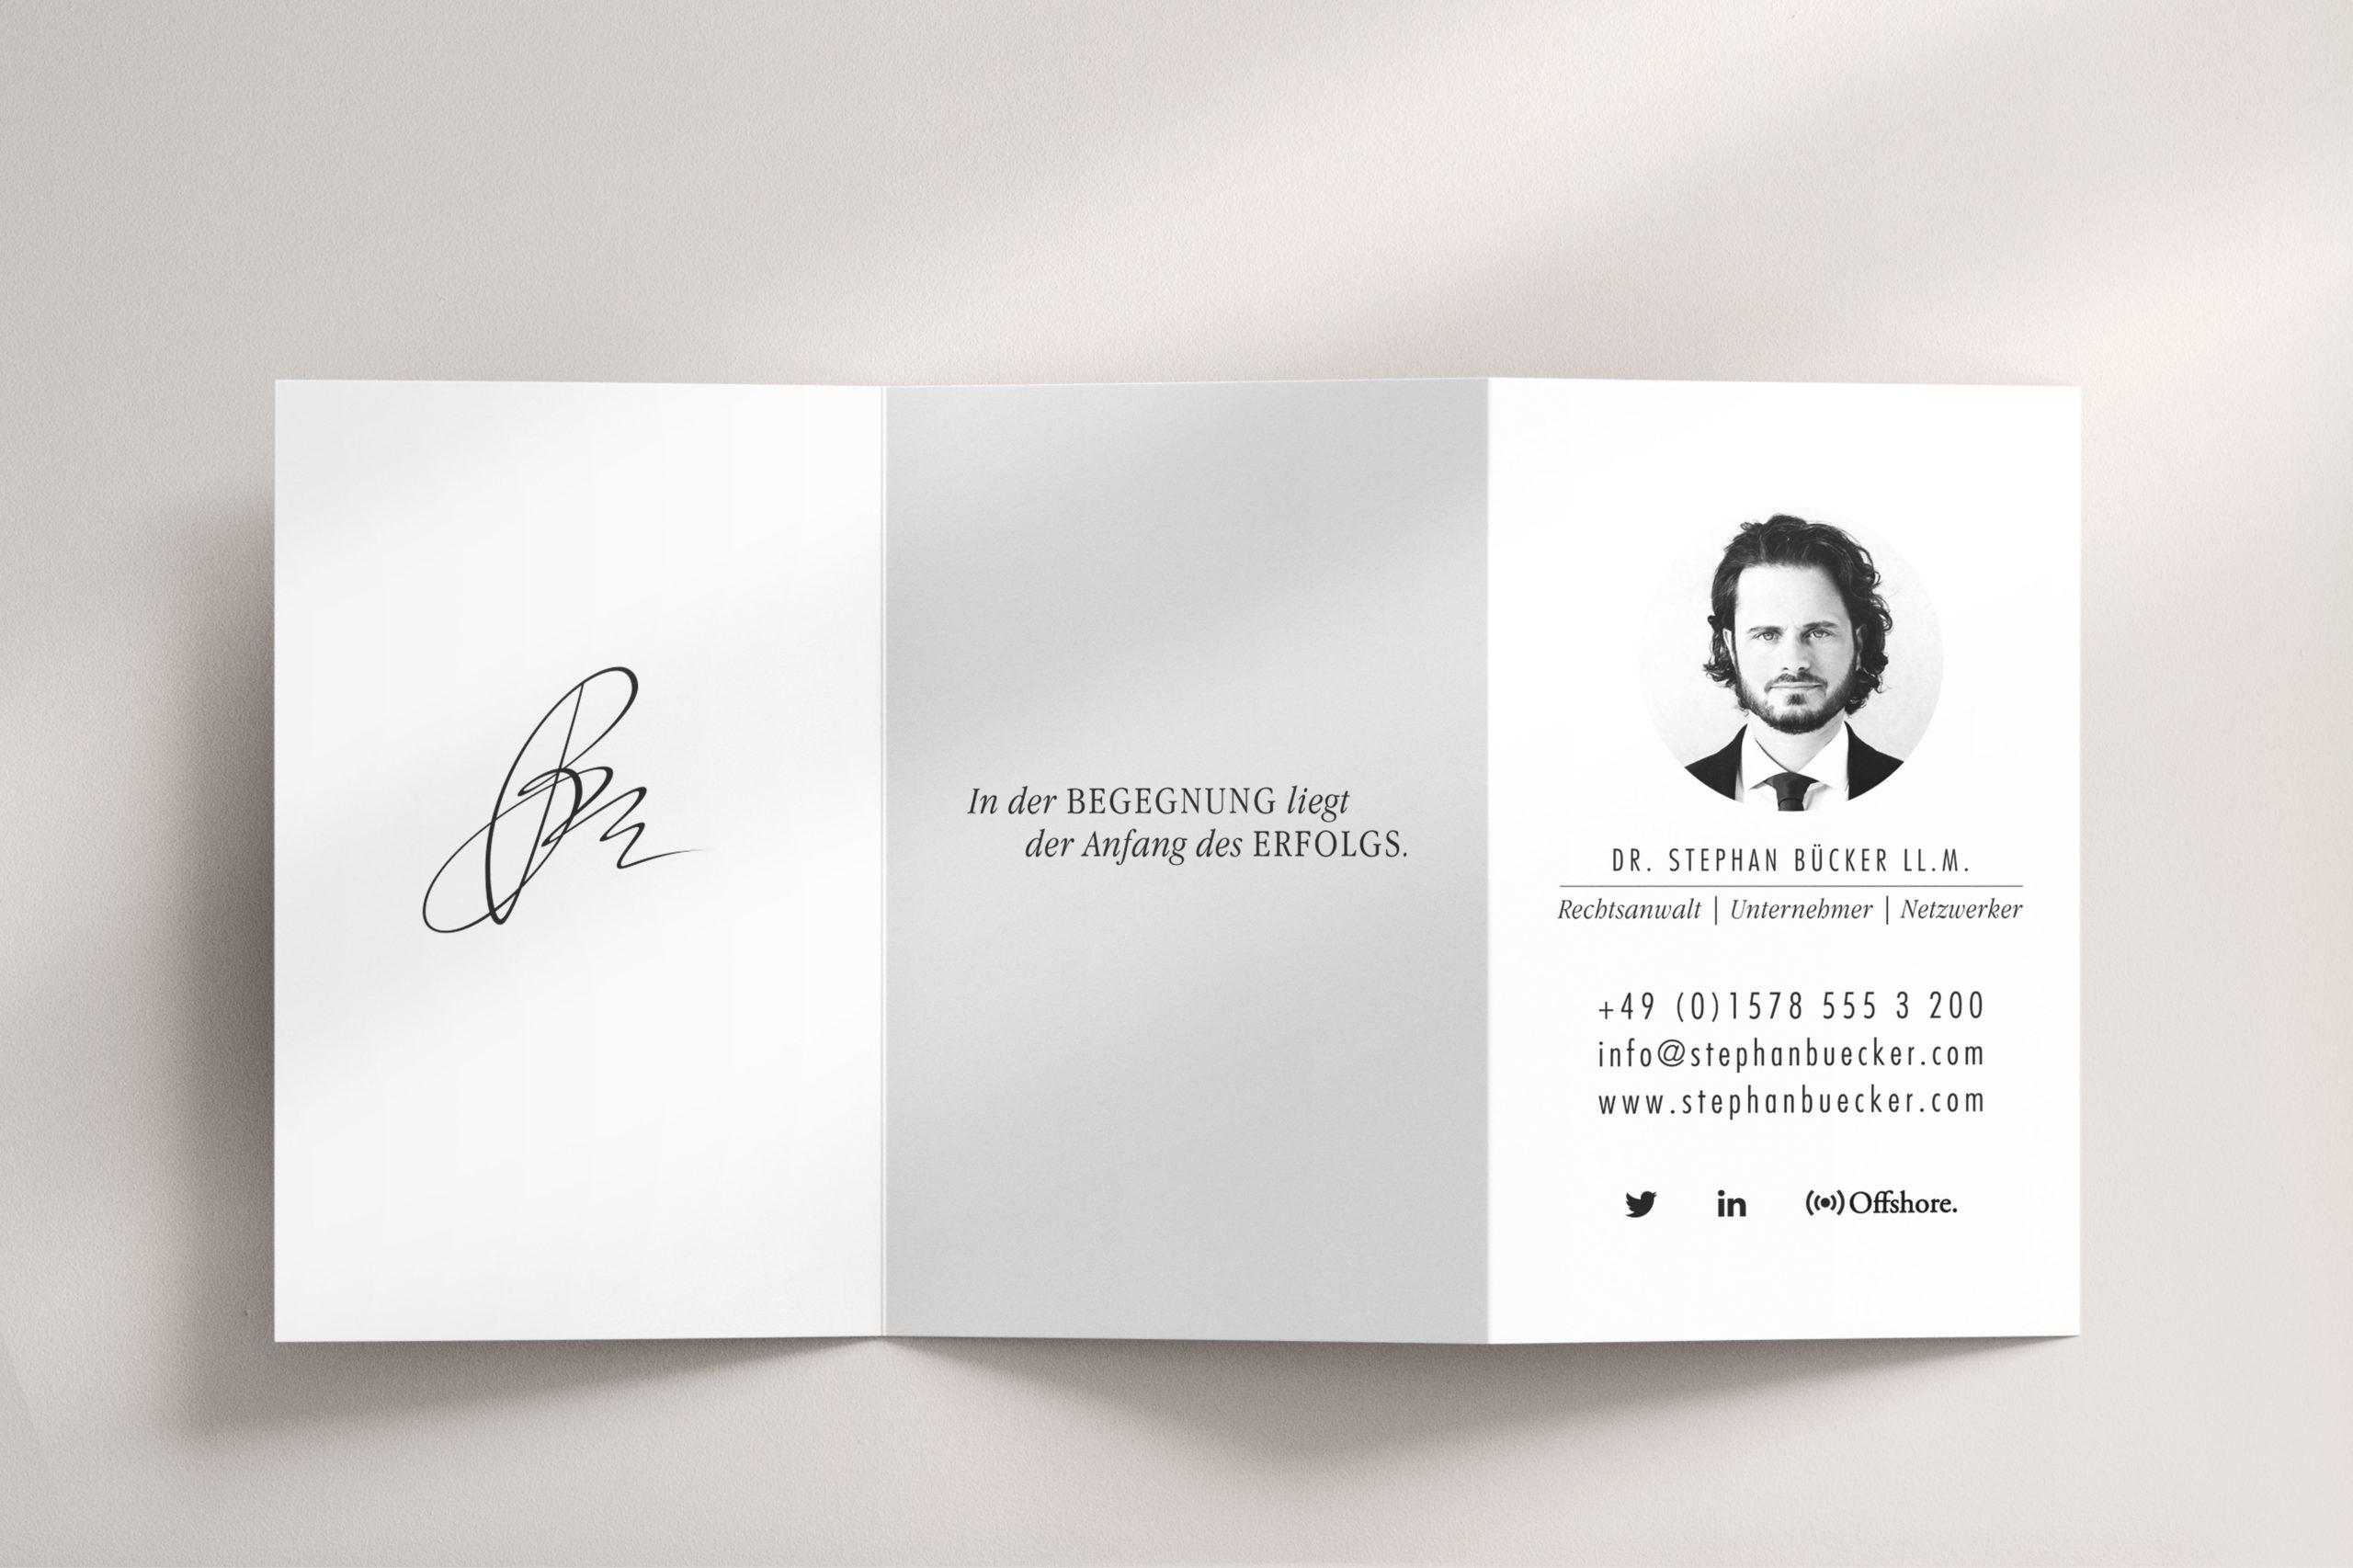 Dr. Stephan Bücker, 3-fache Visitenkarte, Design von Zena Bala